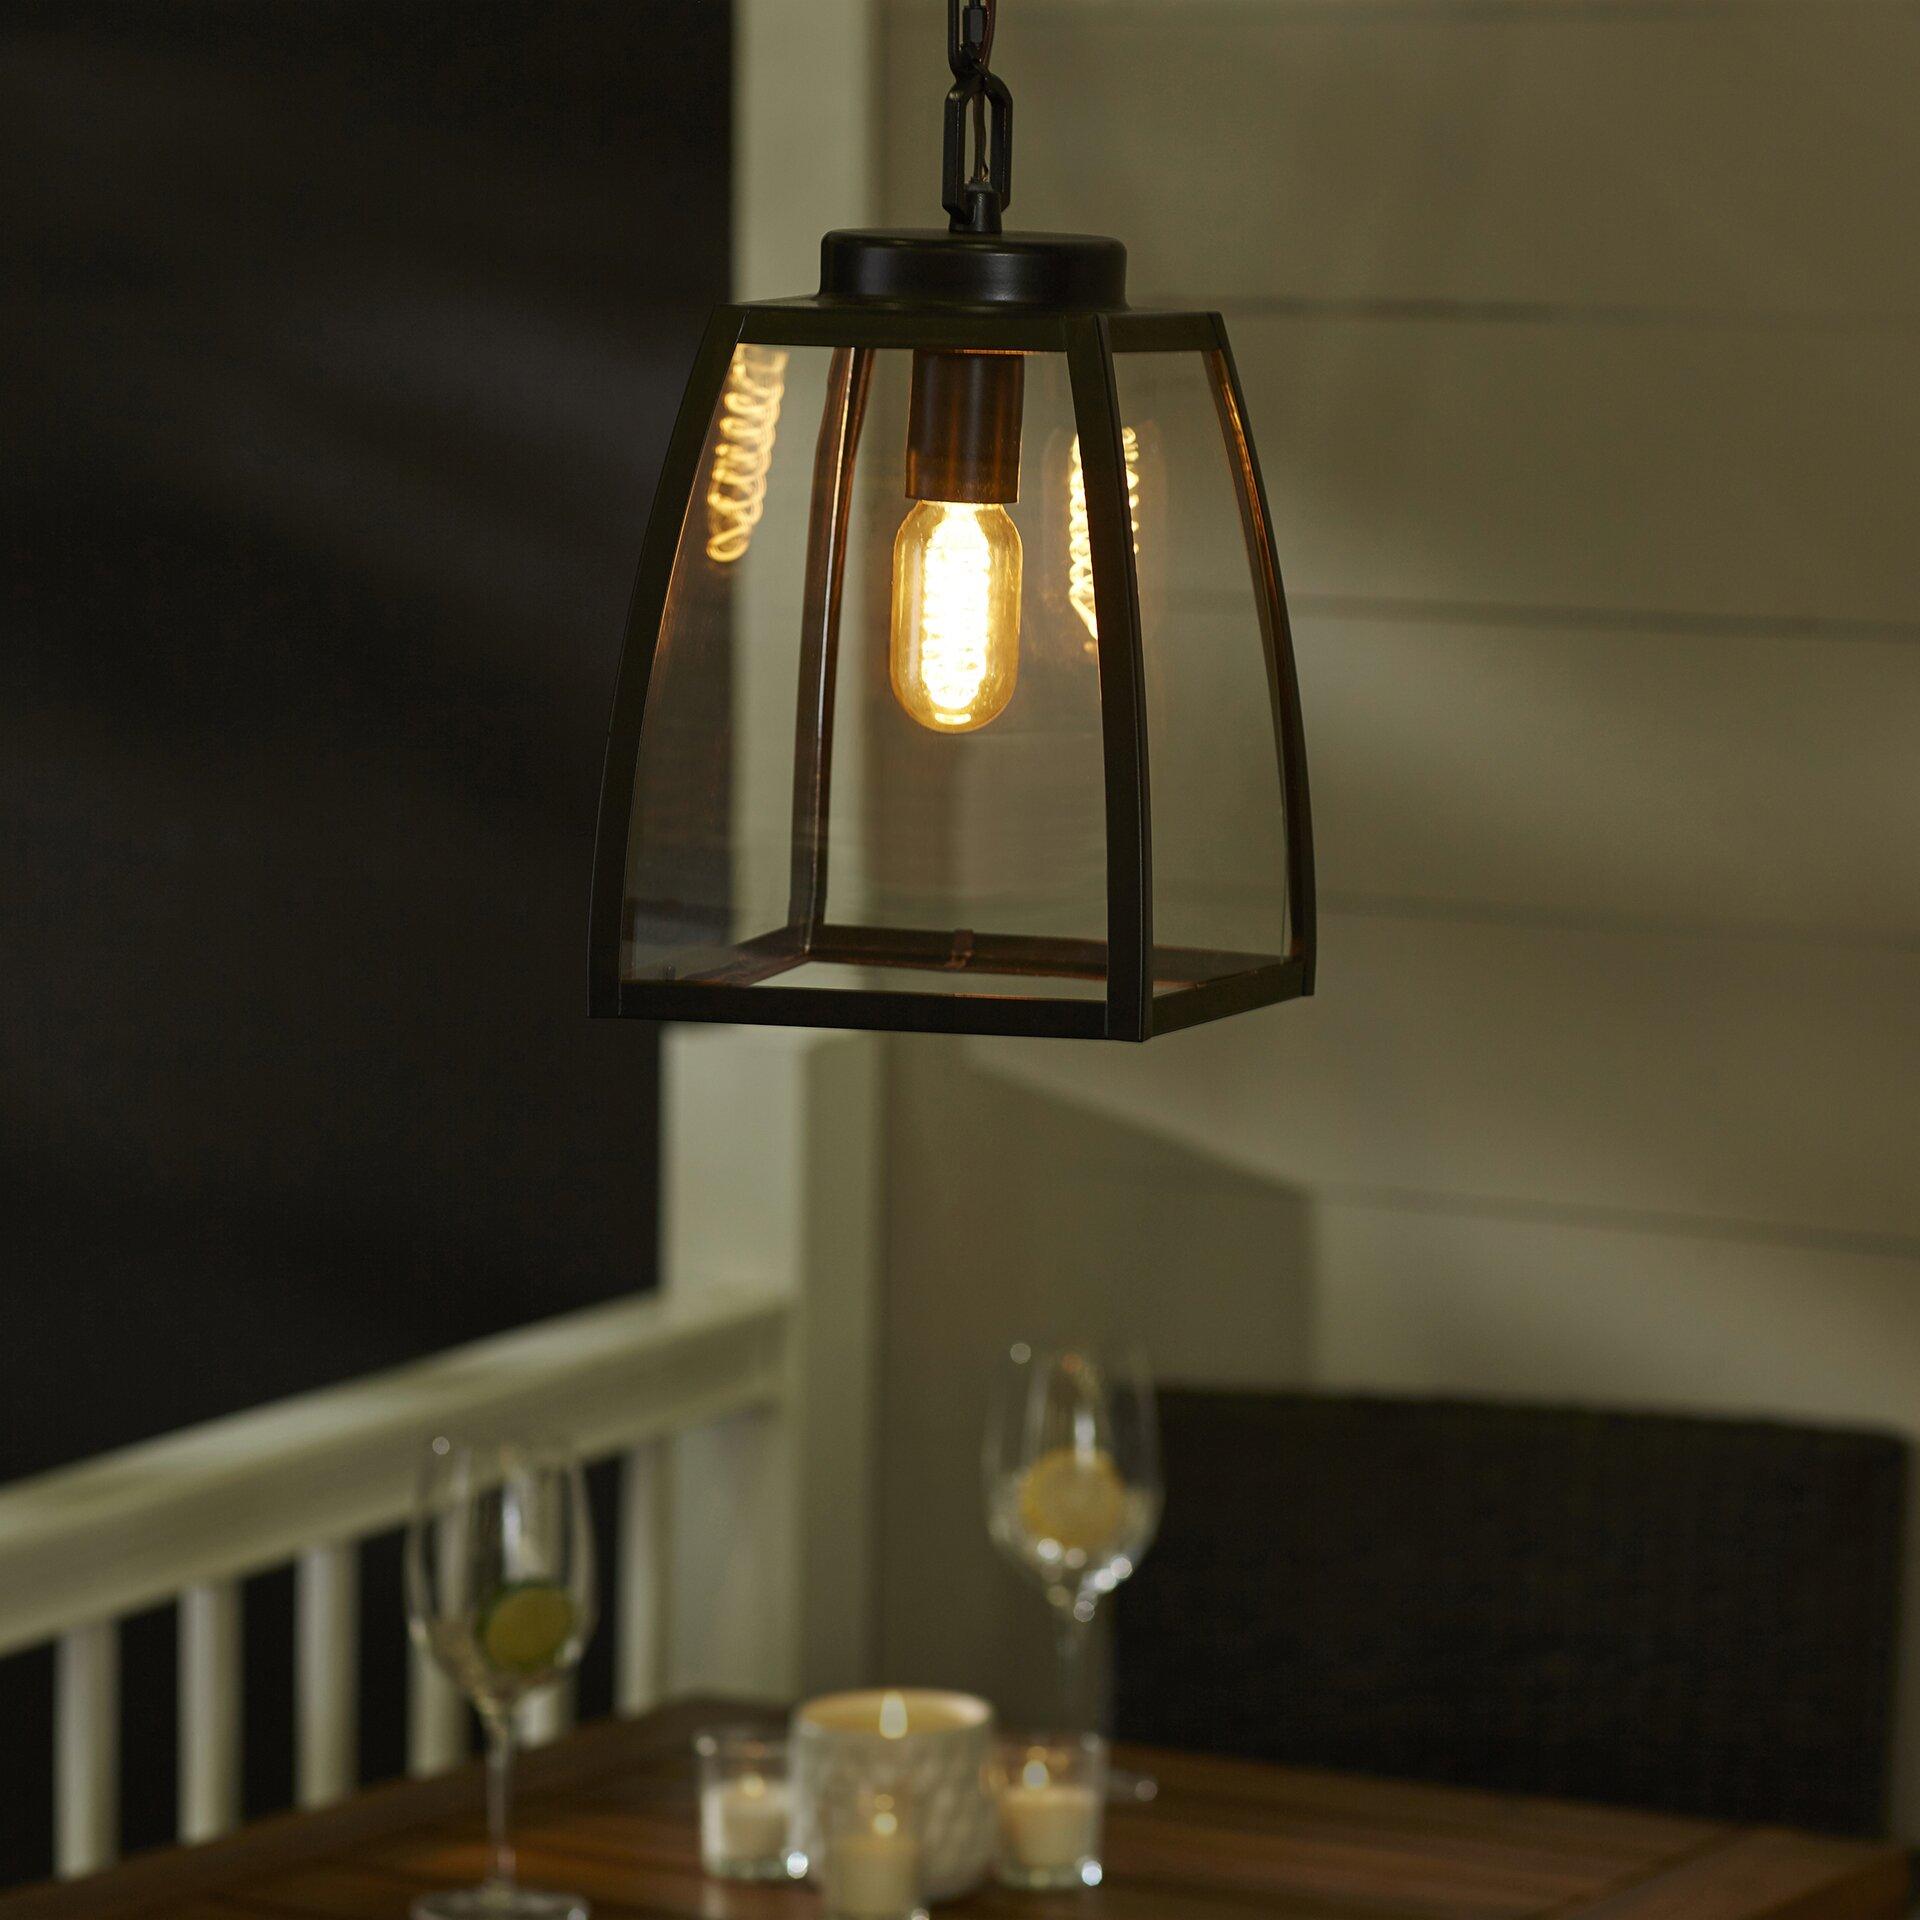 Exterior Mini Lighting: Red Barrel Studio Silver Gulch 1 Light Outdoor Pendant